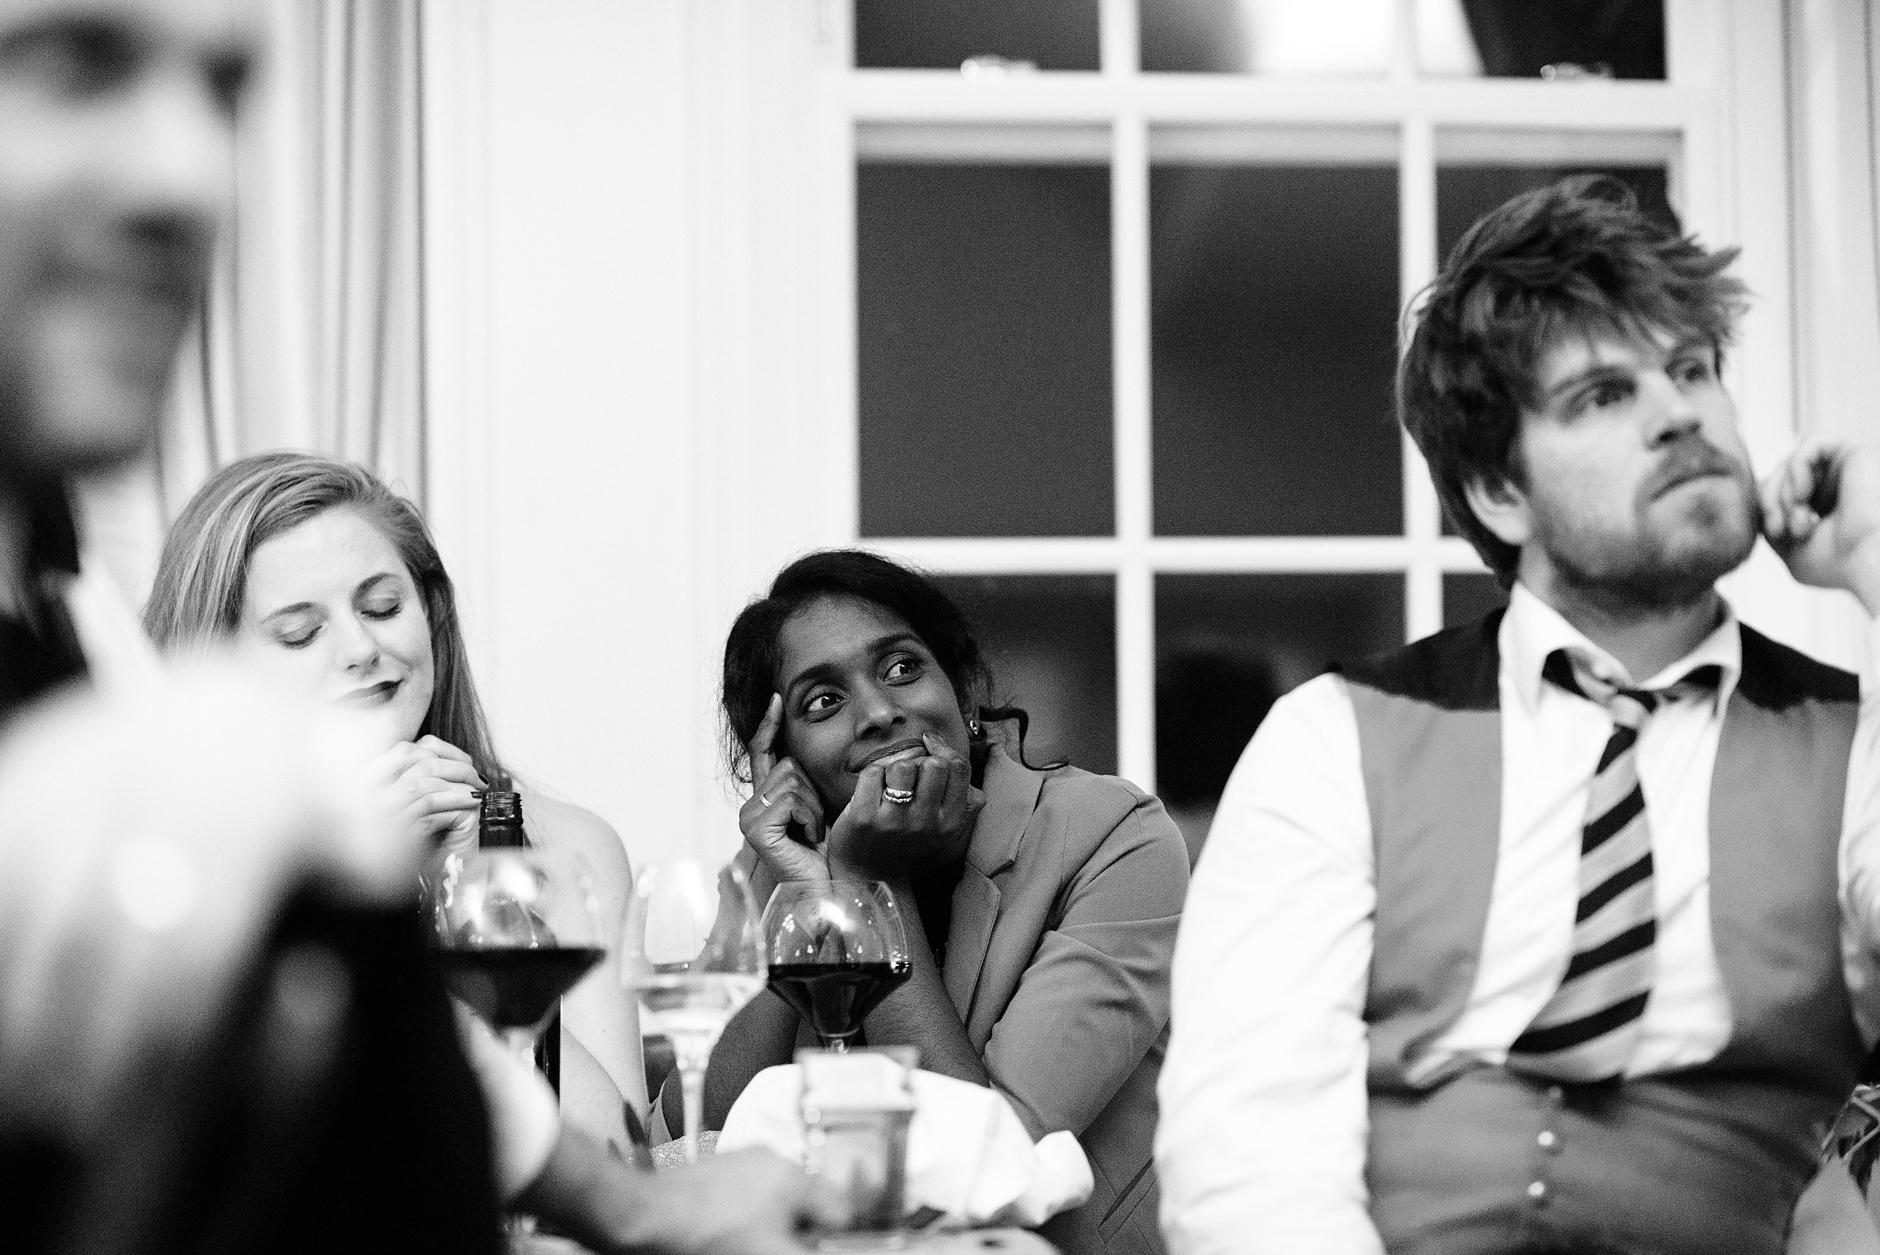 Glentruim-Wedding-Nikki-Leadbetter-Photography-279.jpg